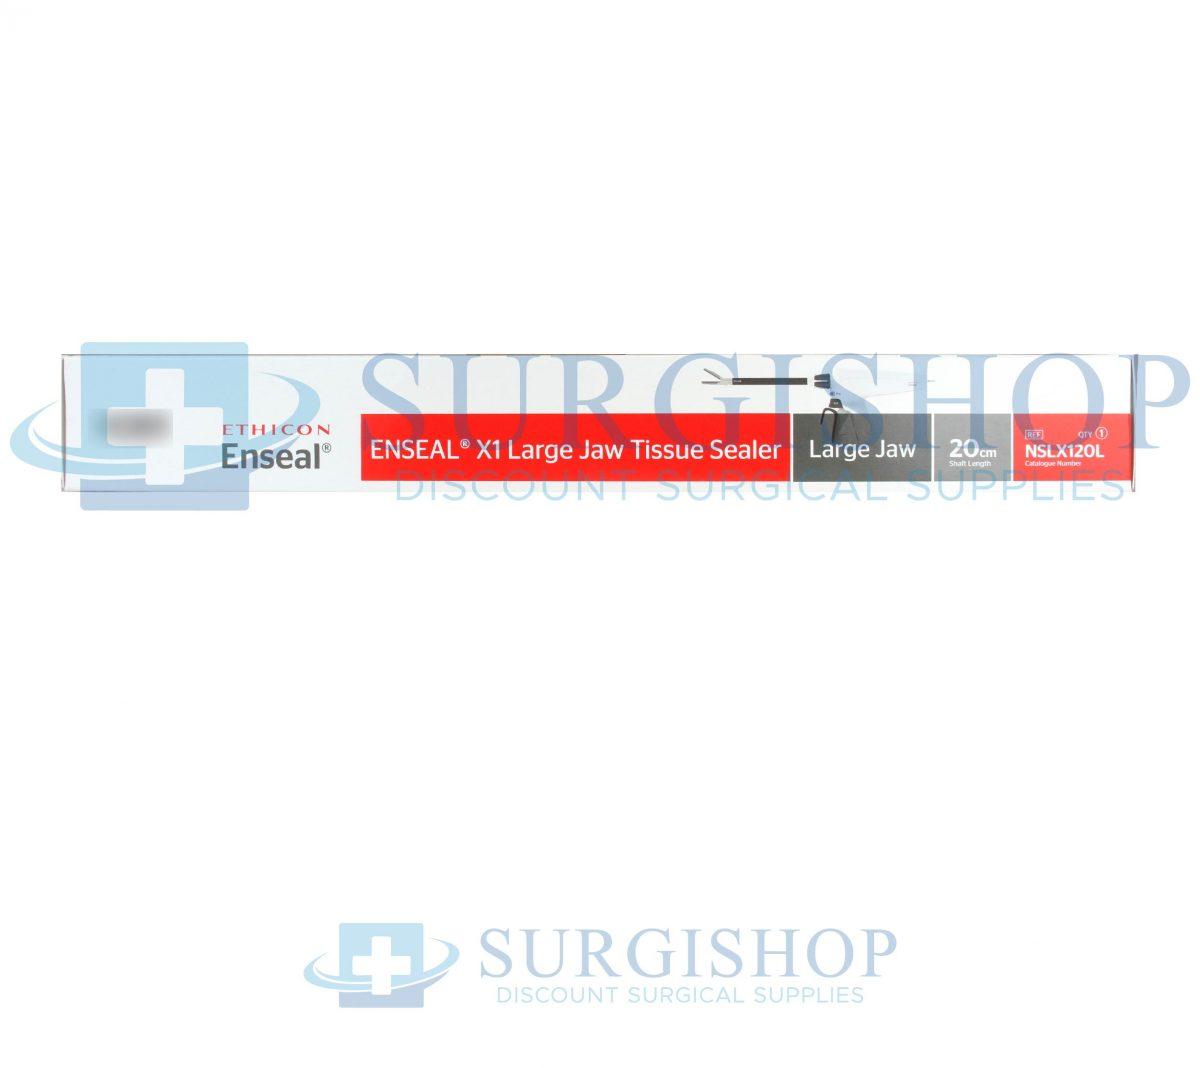 NSLX120L – Ethicon Enseal X1 Curved Tip Tissue Sealer Large Jaw 13.0mm x 20.0cm Each